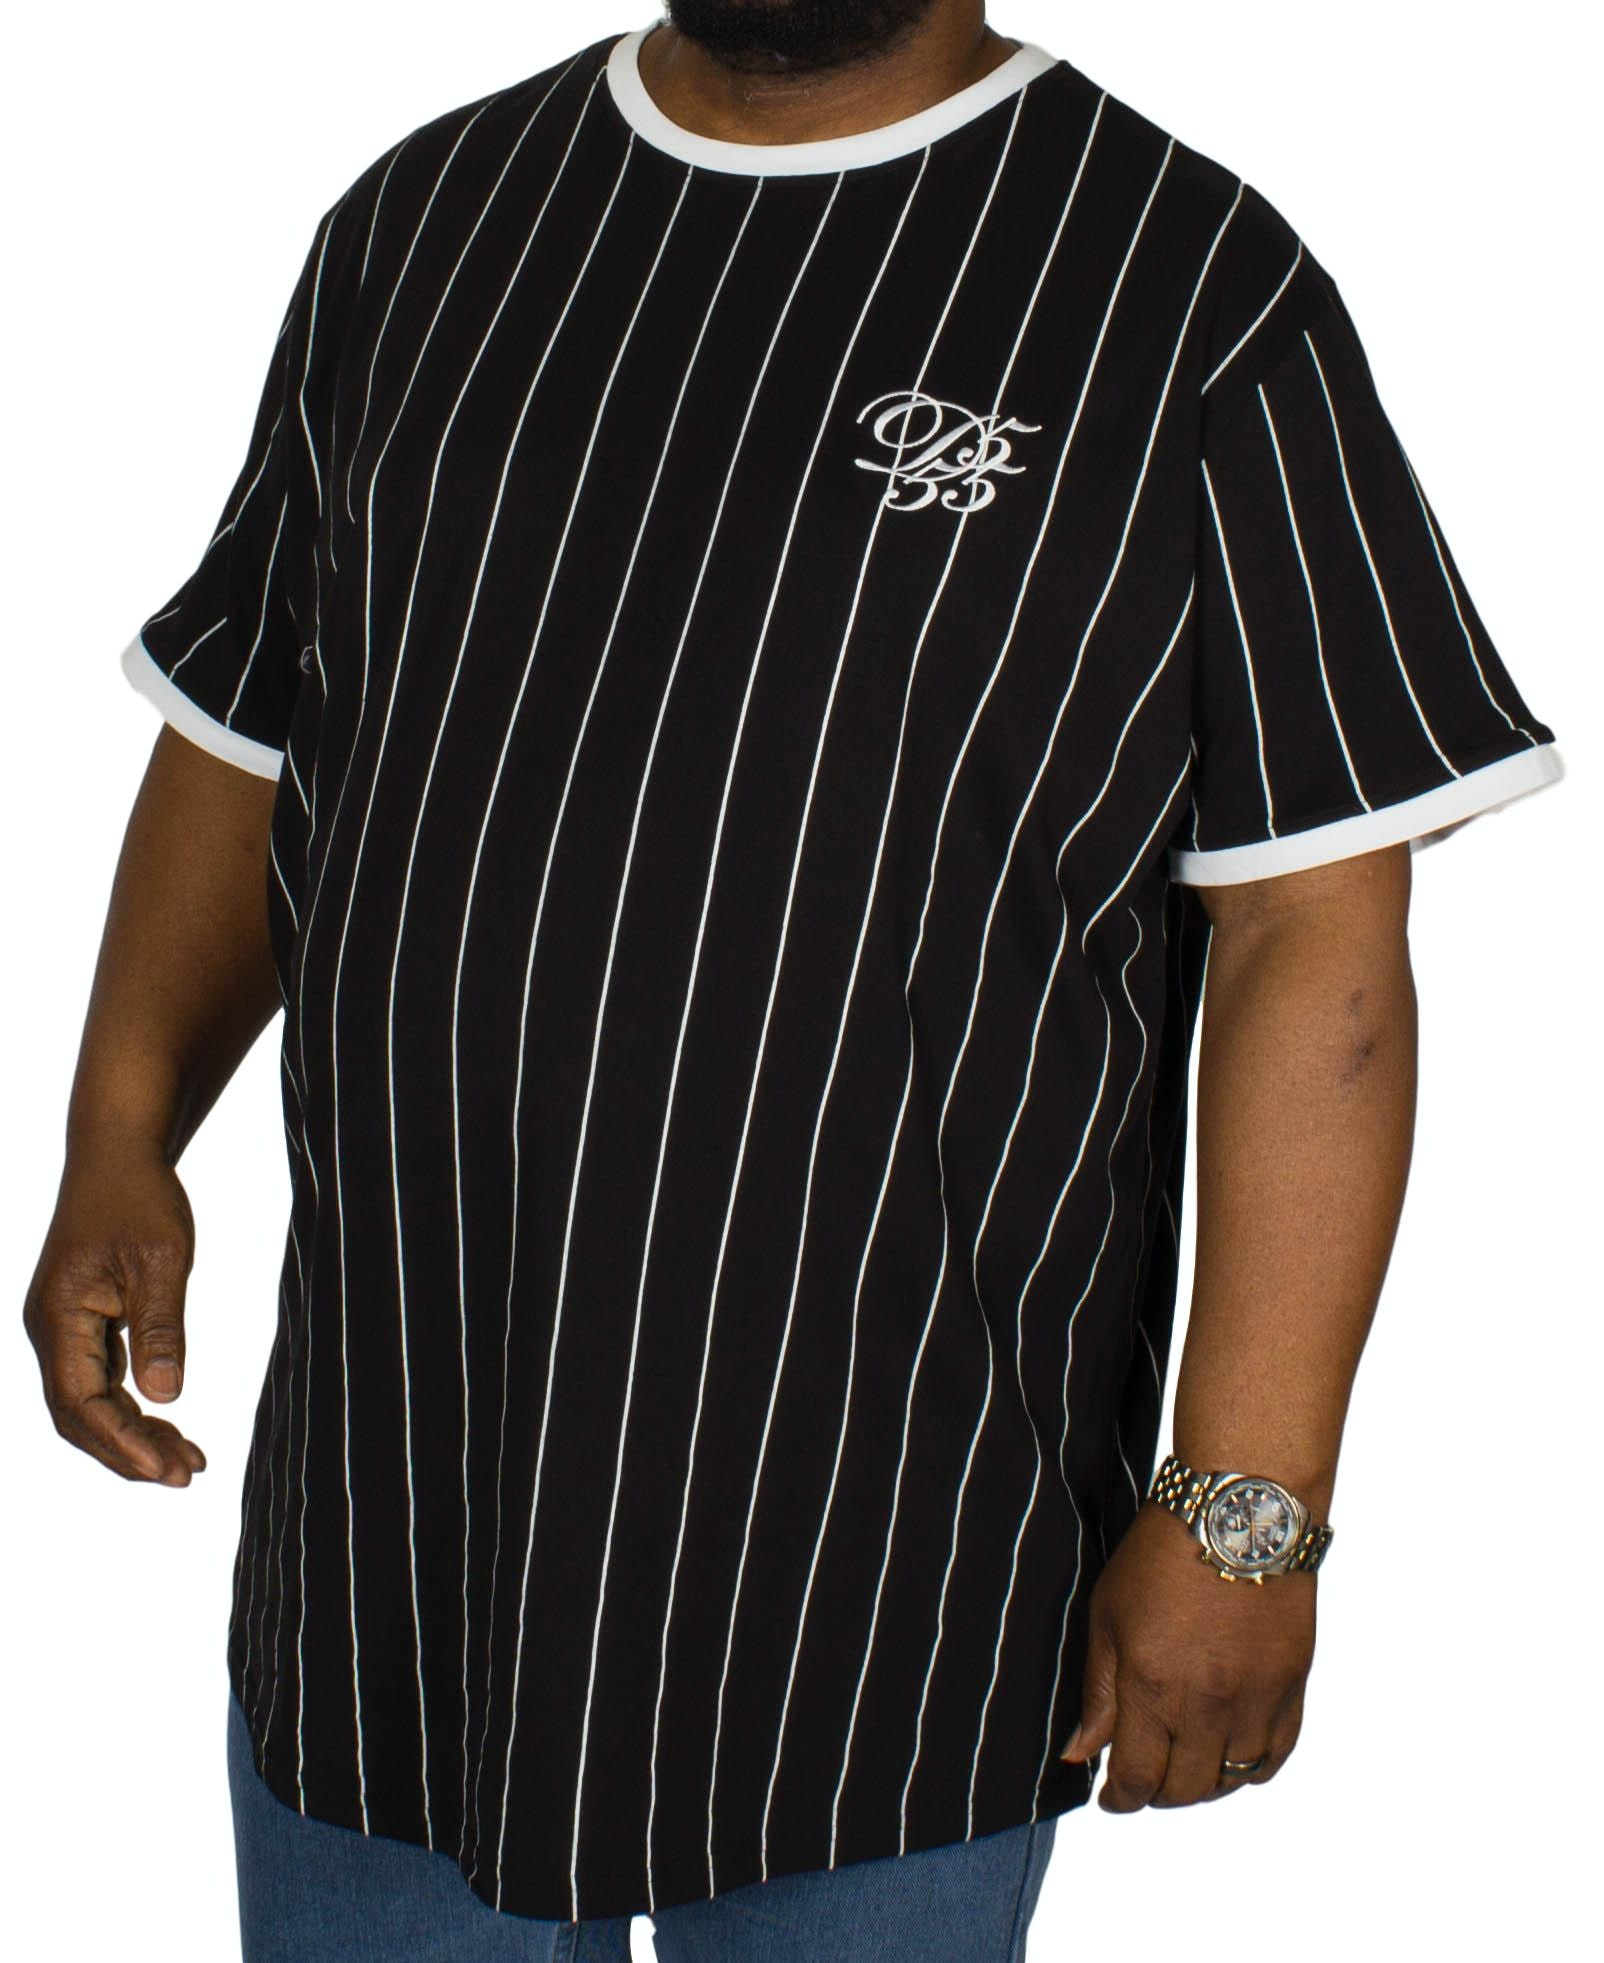 D555 Chatham Stripe T-Shirt Black